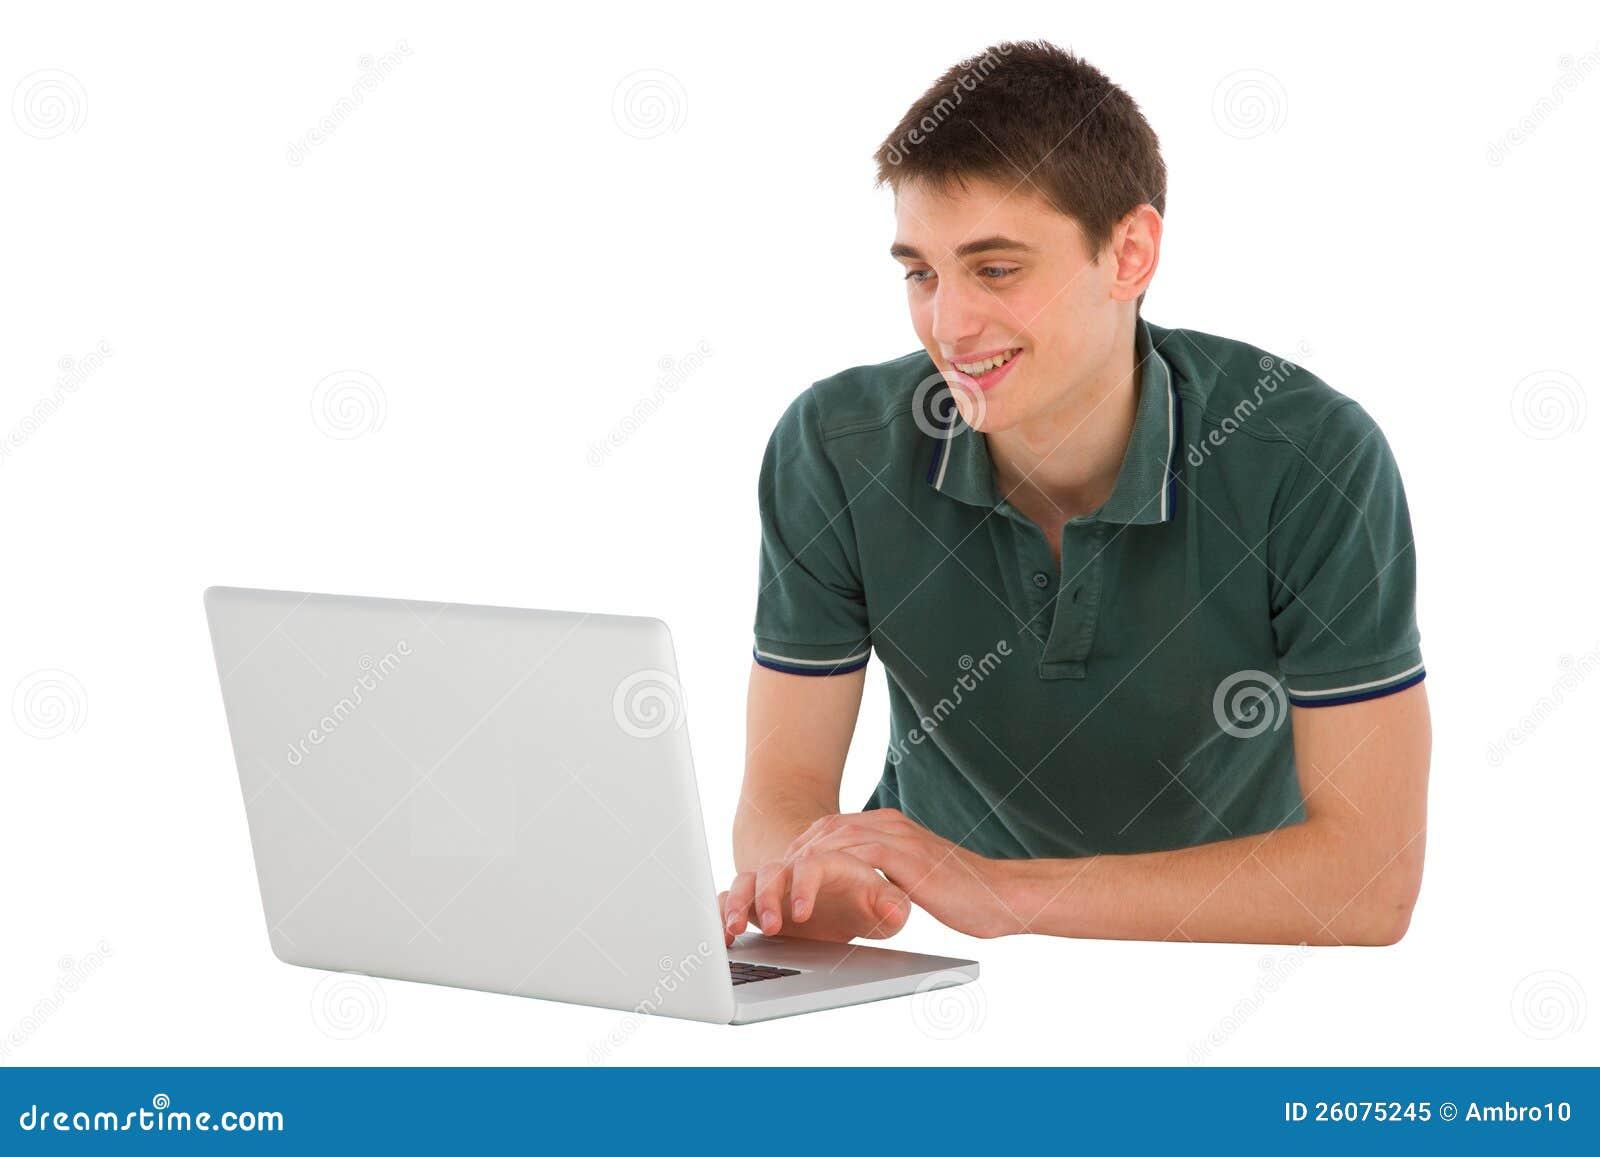 Teenage boy with laptop lying down